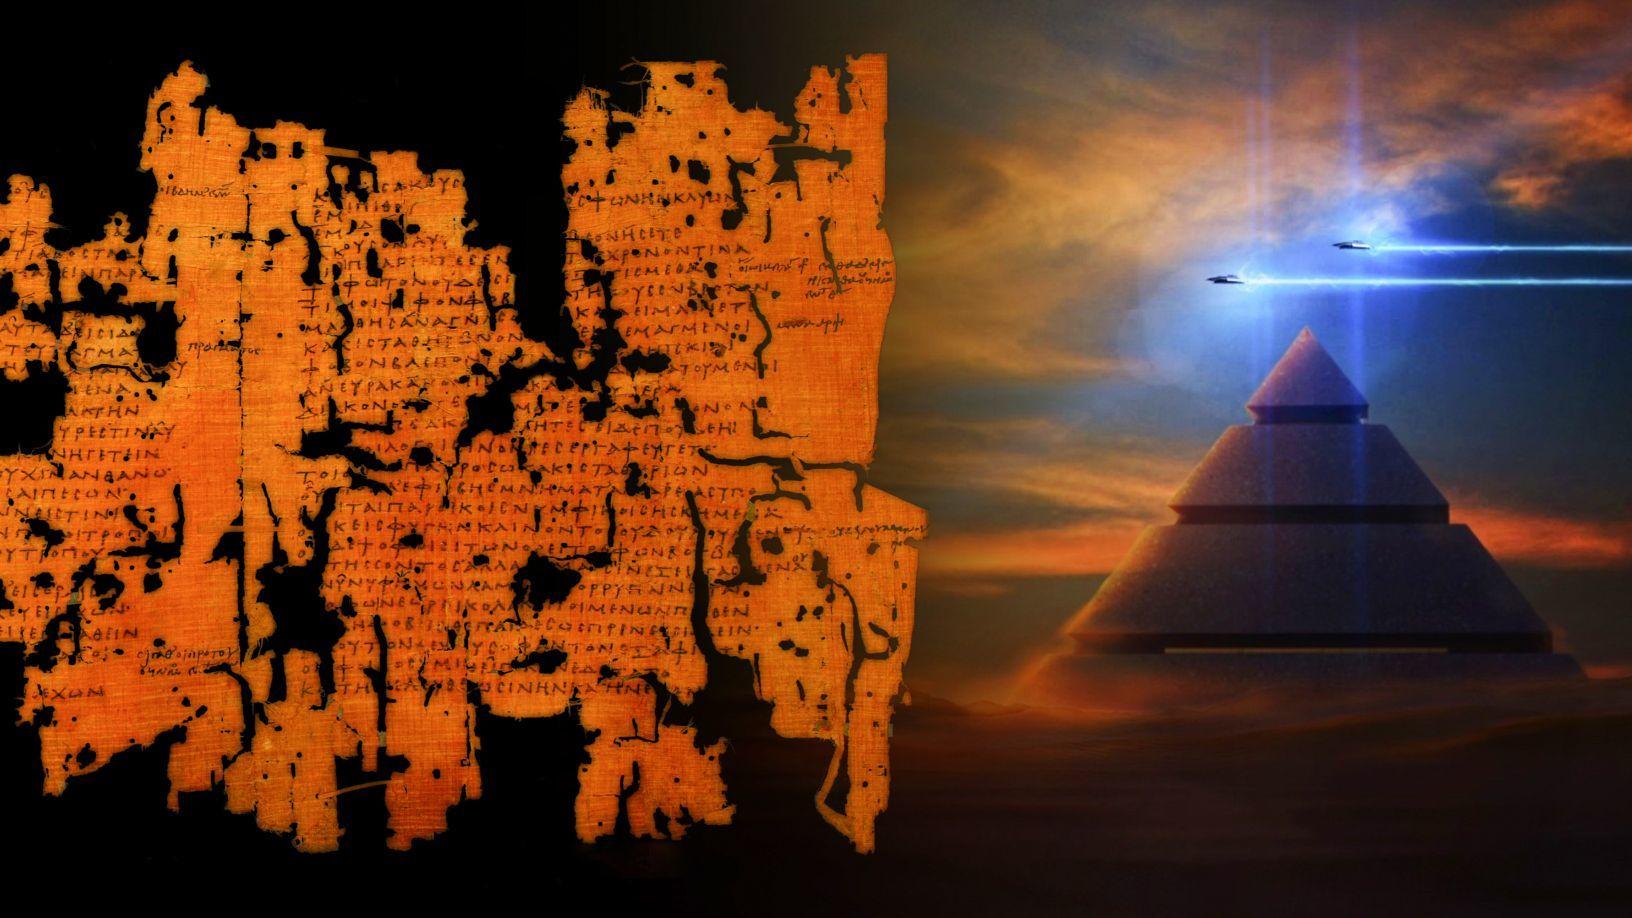 Papyrus Tulli: Did Ancient Egyptians Encounter A Massive UFO?